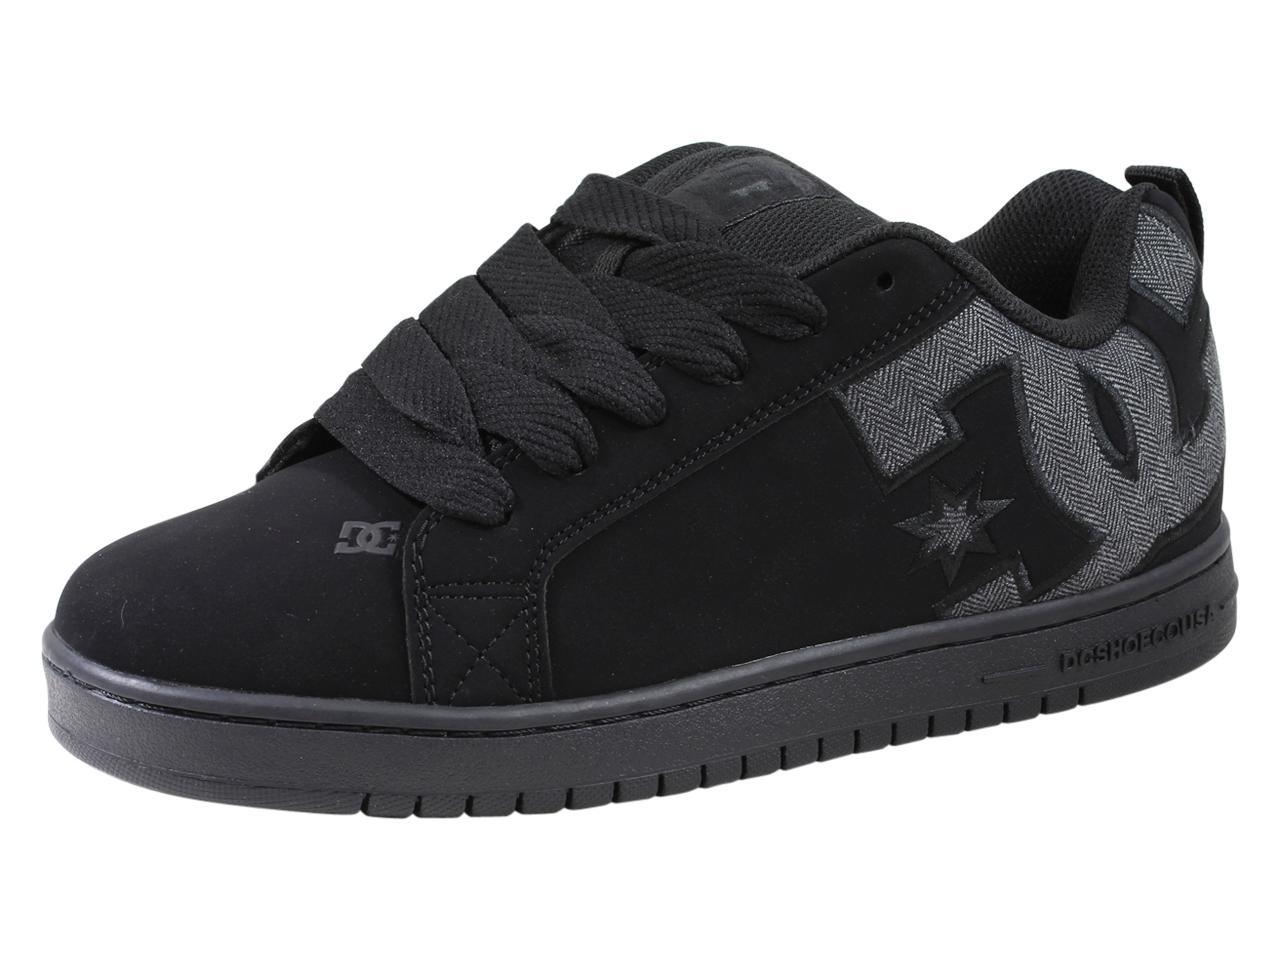 Image of DC Men's Court Graffik SE Skateboarding Sneakers Shoes - Black - 9 D(M) US